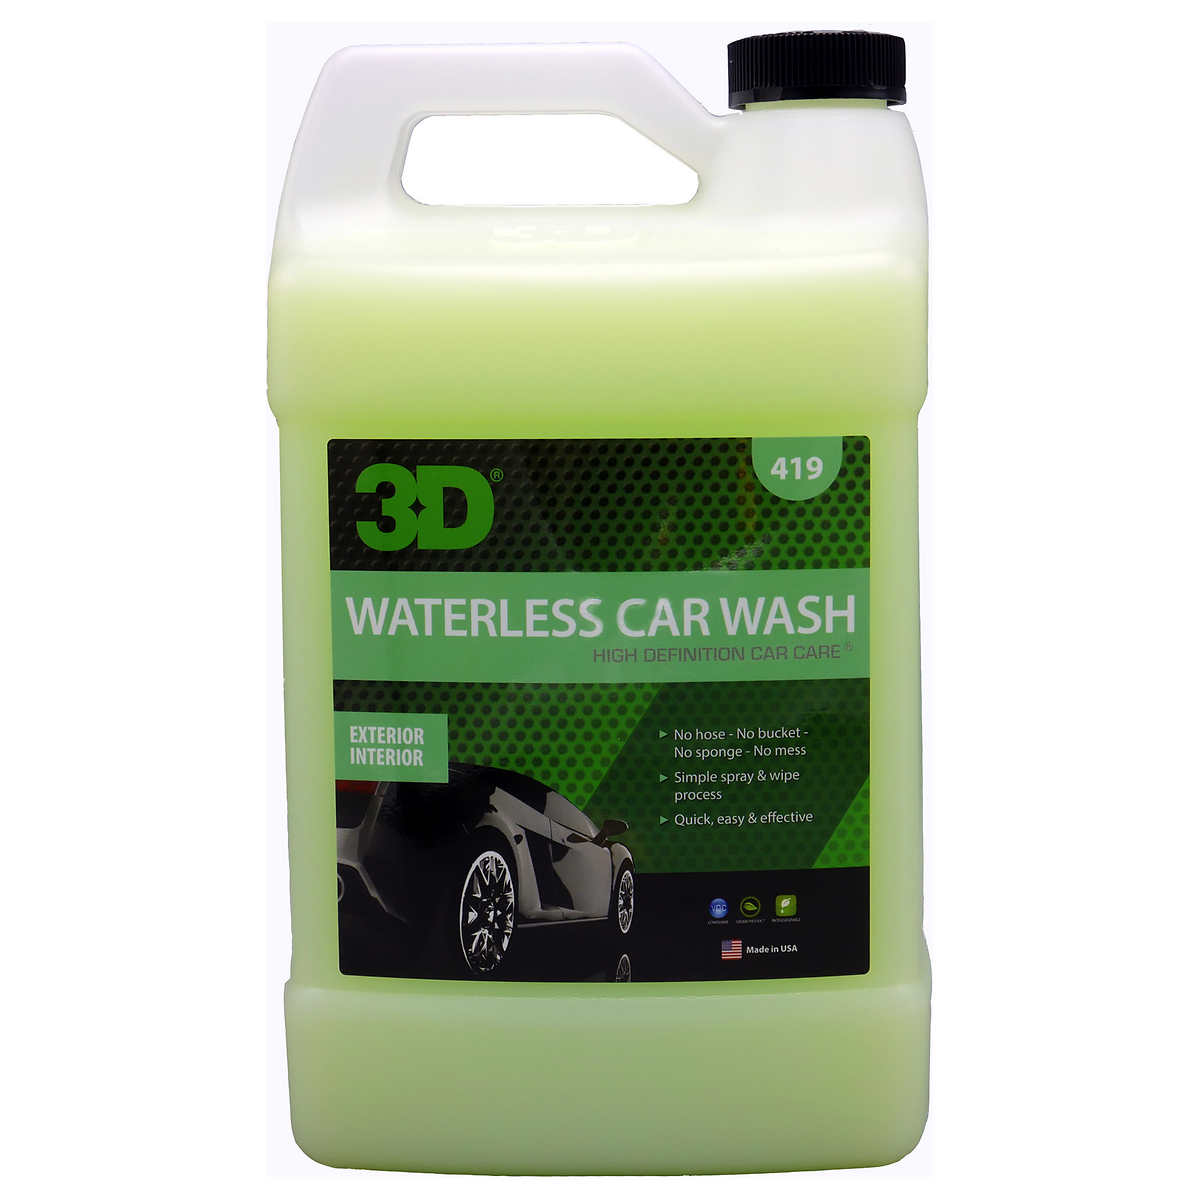 wash wax costco 3d waterless car wash 1 gallon refill